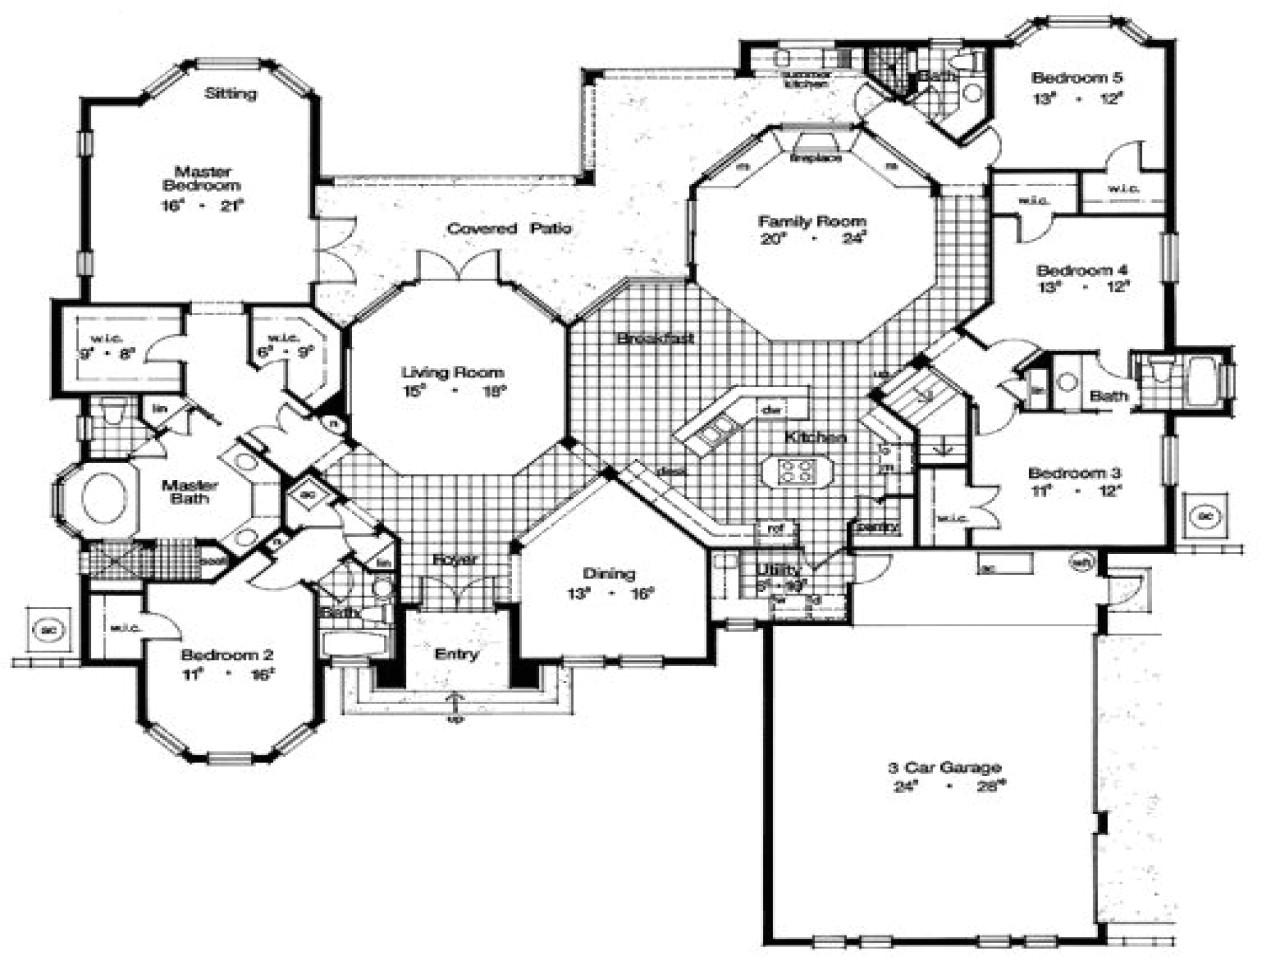 204fb9576c84ab79 best minecraft house blueprints minecraft house blueprints plans